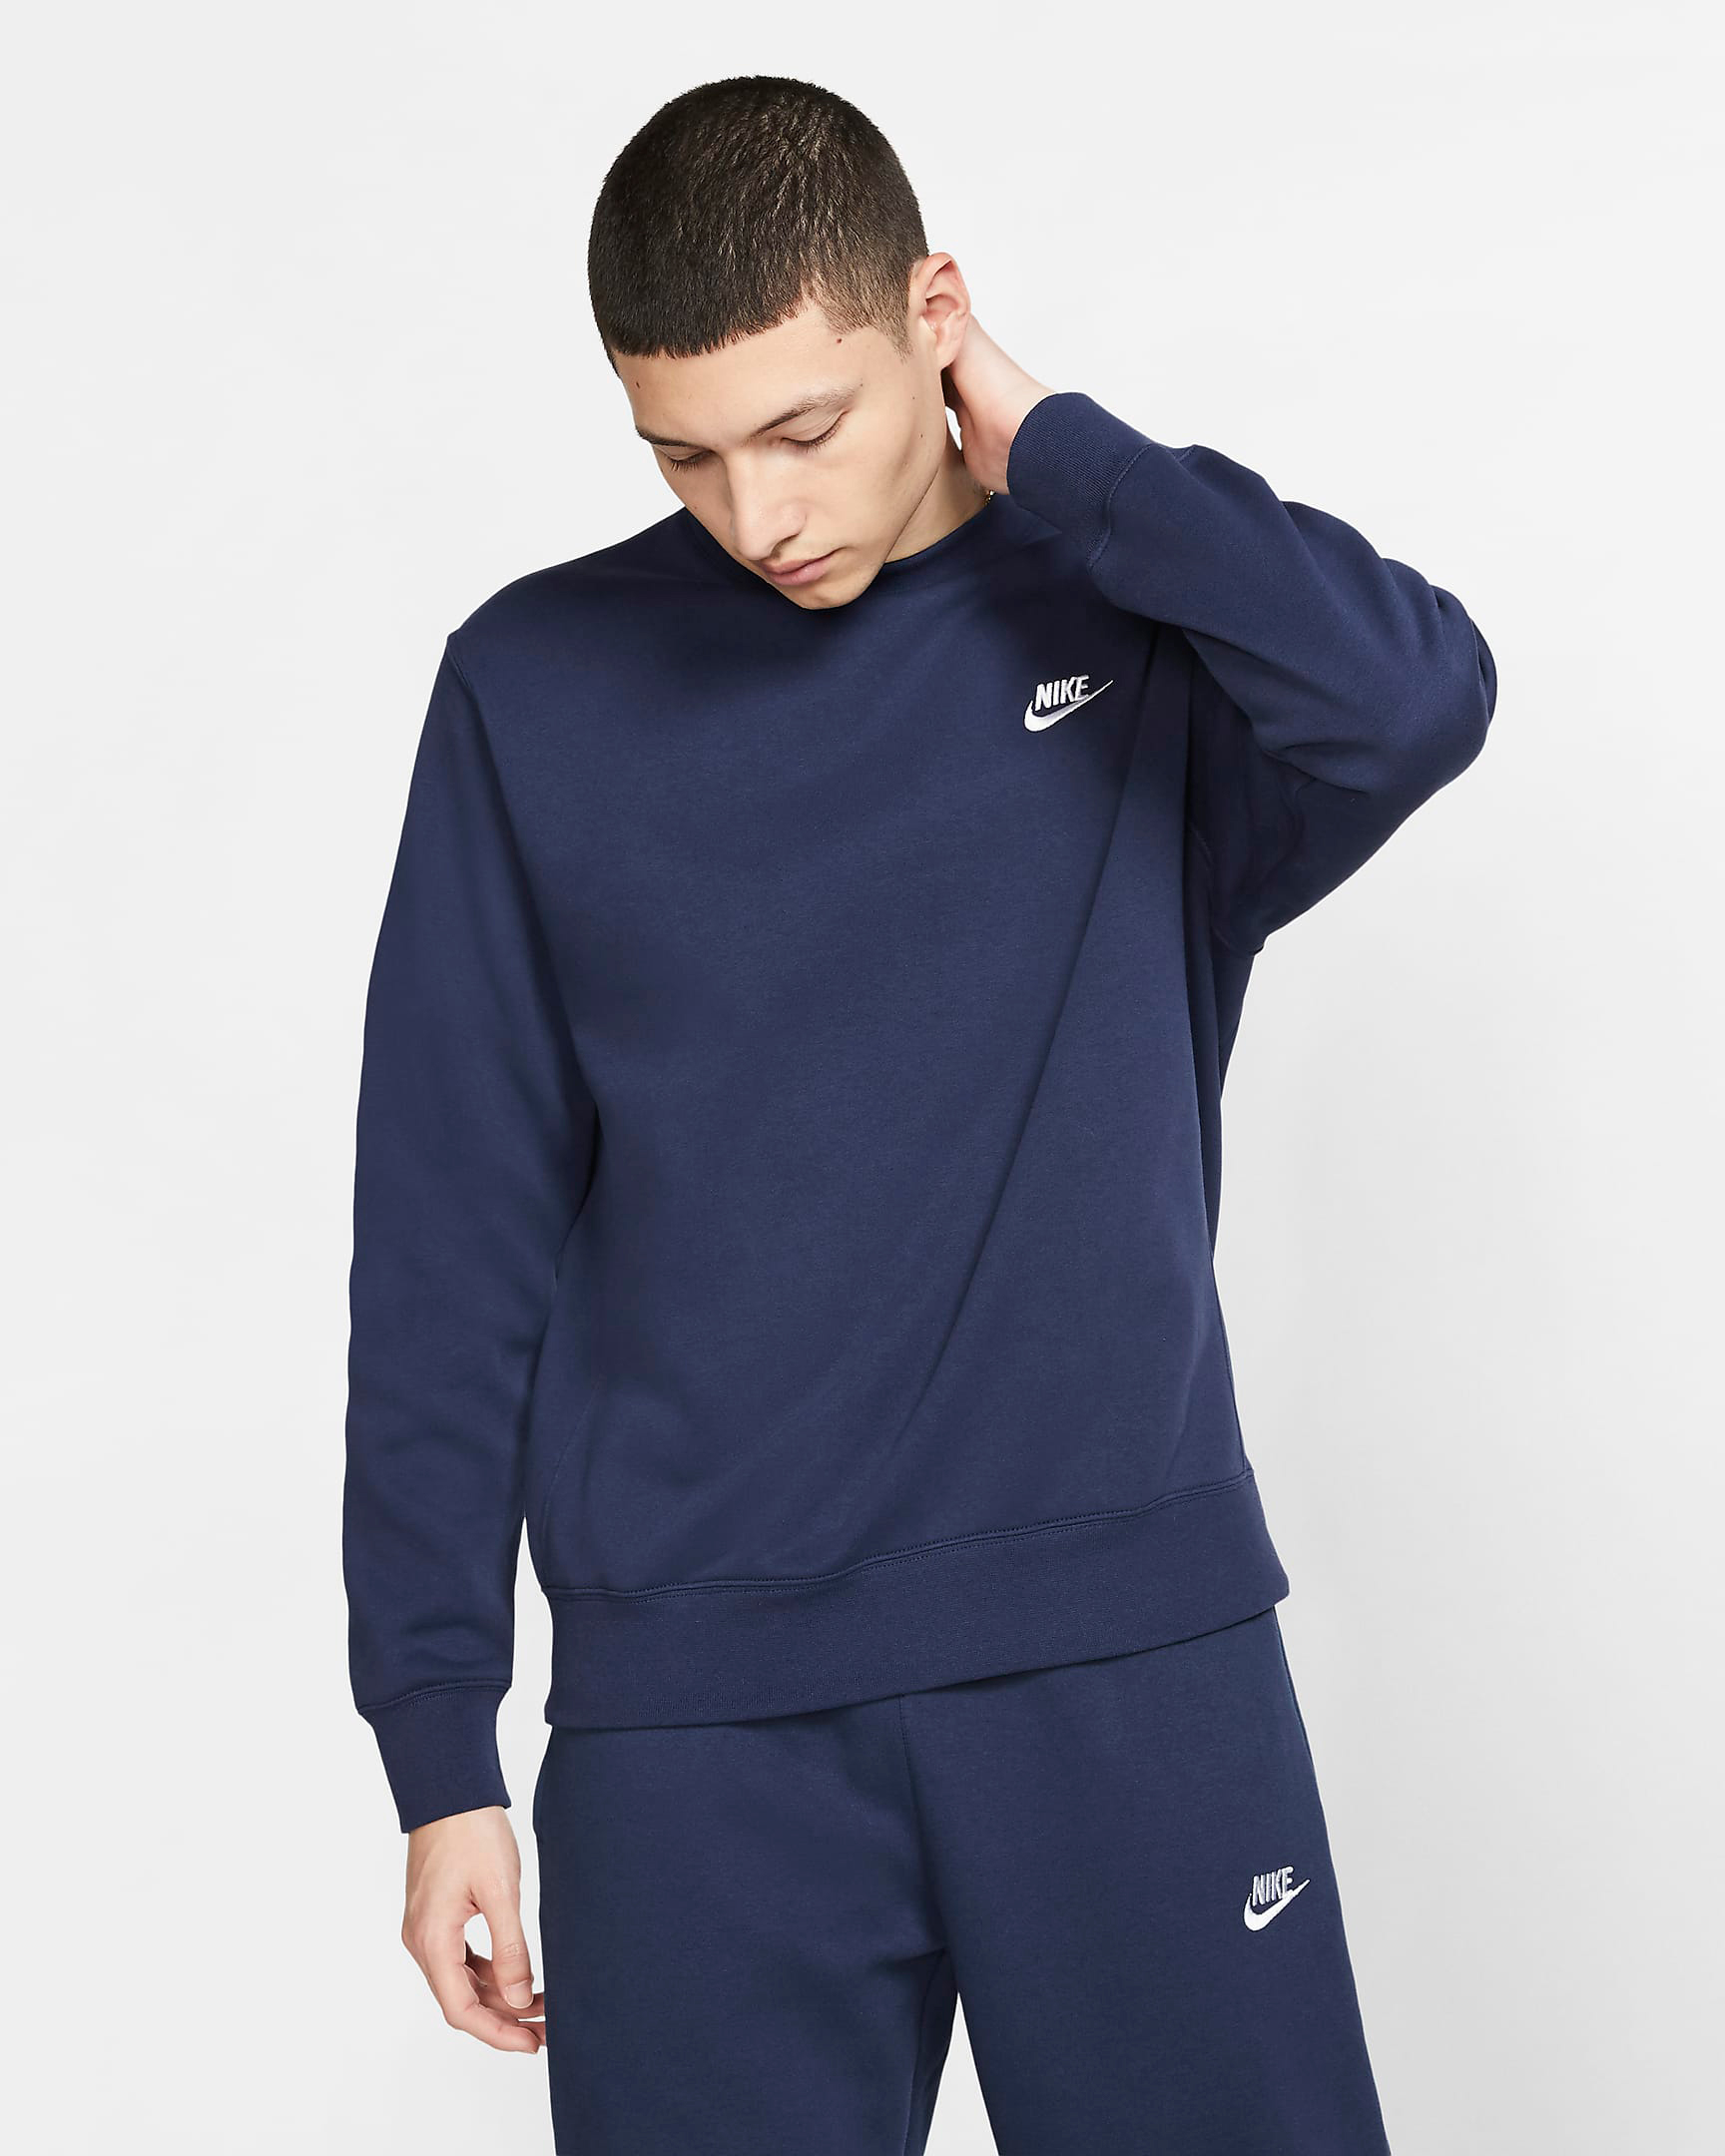 jordan-3-midnight-navy-nike-crew-sweatshirt